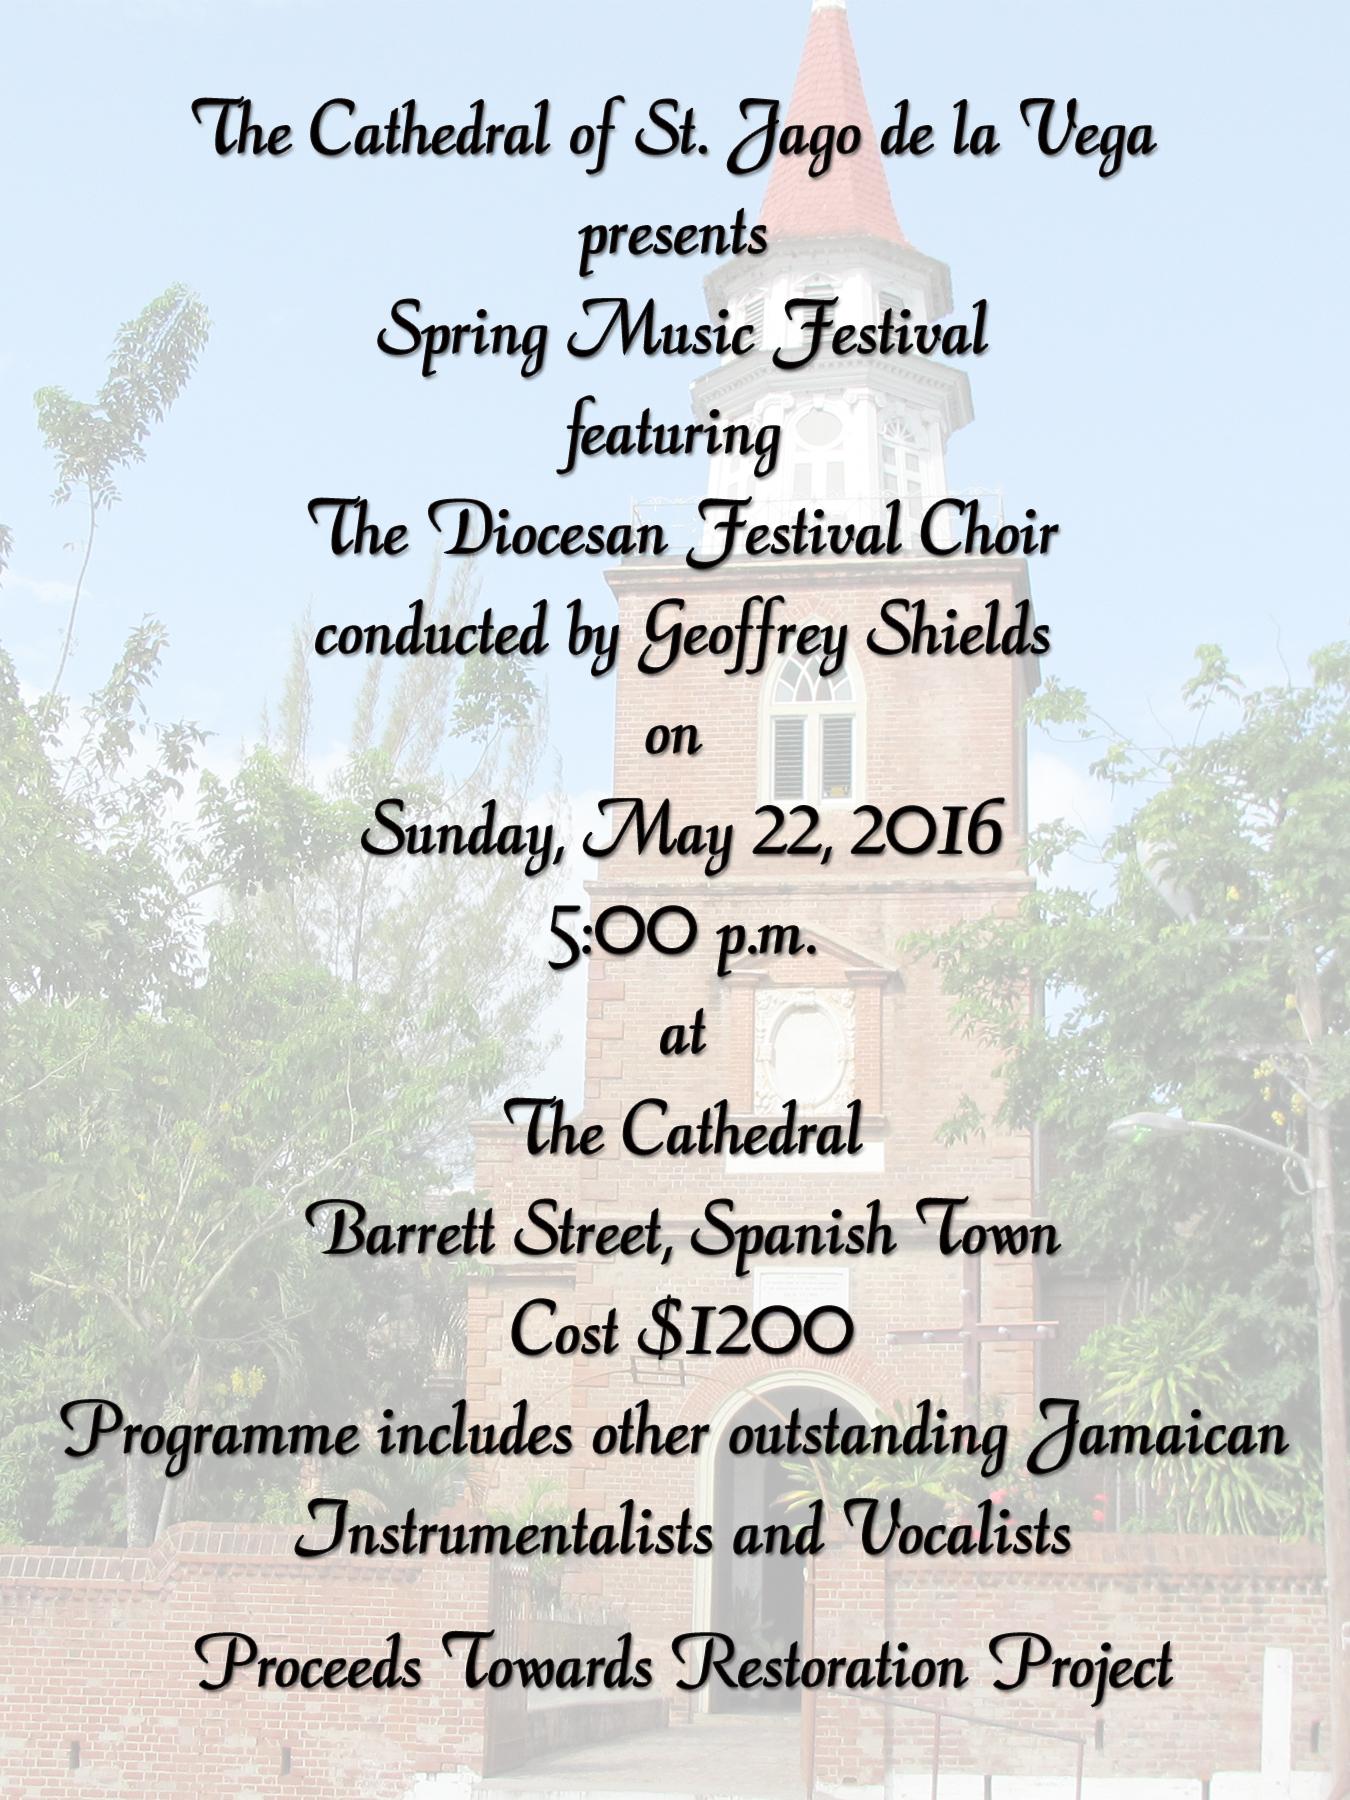 The Cathedral of St. Jago de la Vega – Spring Time Music Festival 2016